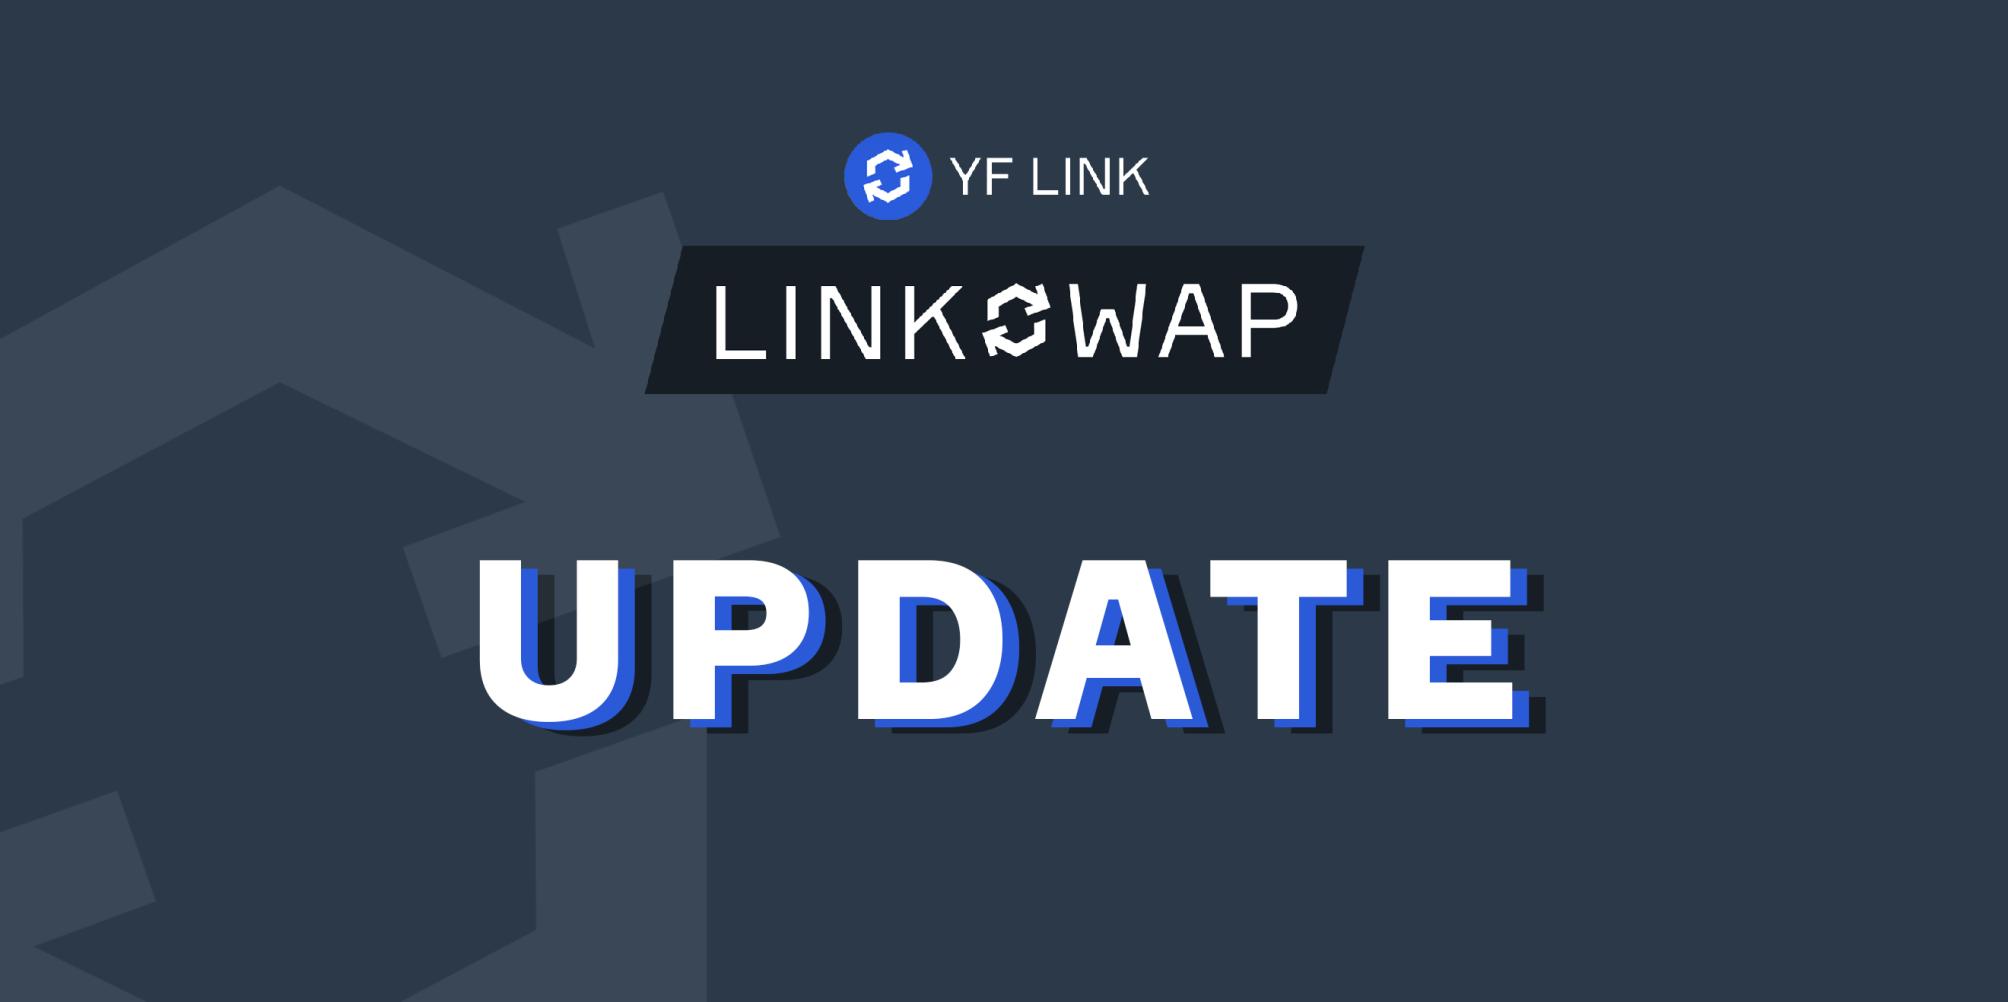 Linkswap update: Staking Rewards, Roadmap and New Core Team!